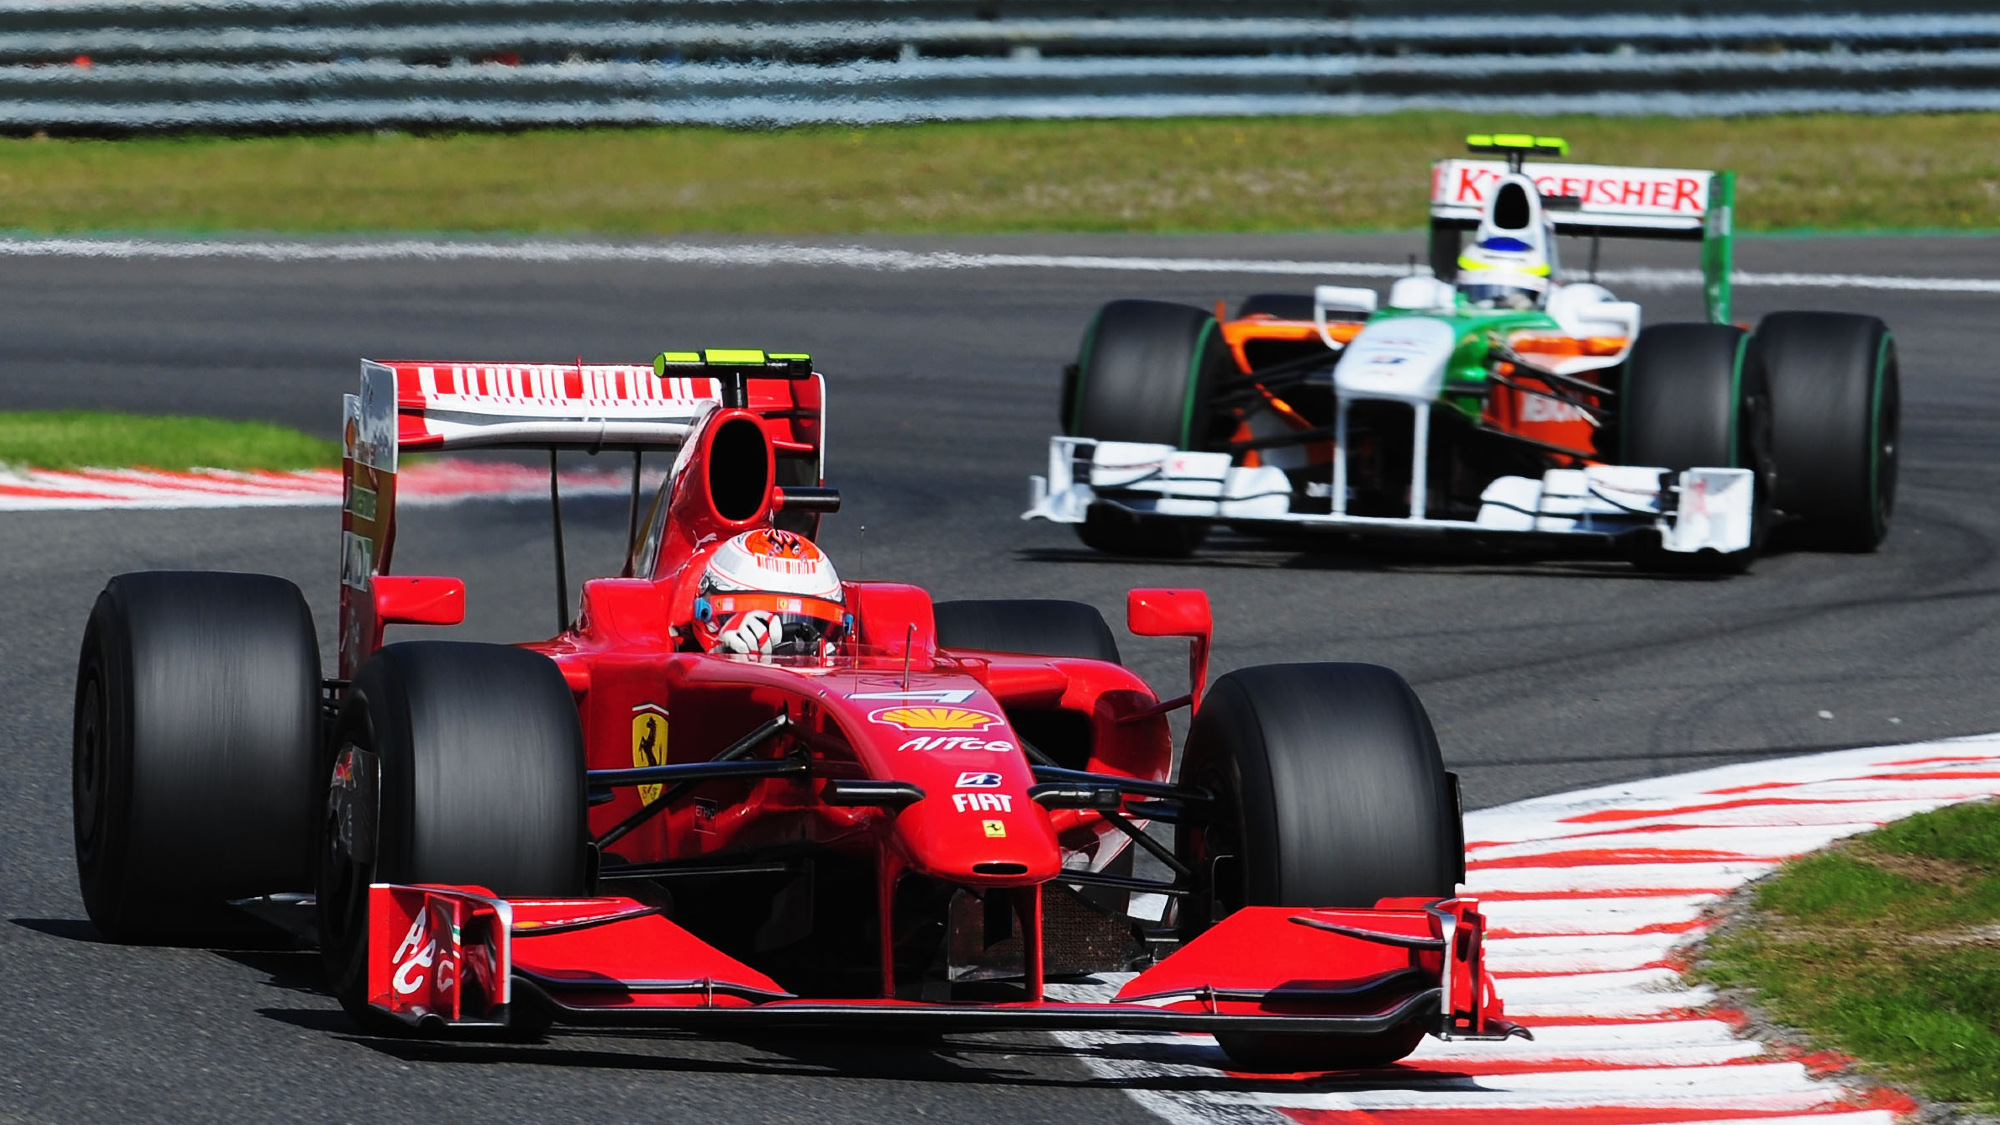 Kimi Raikkonen, Giancarlo Fisichella, 2009 Belgian GP